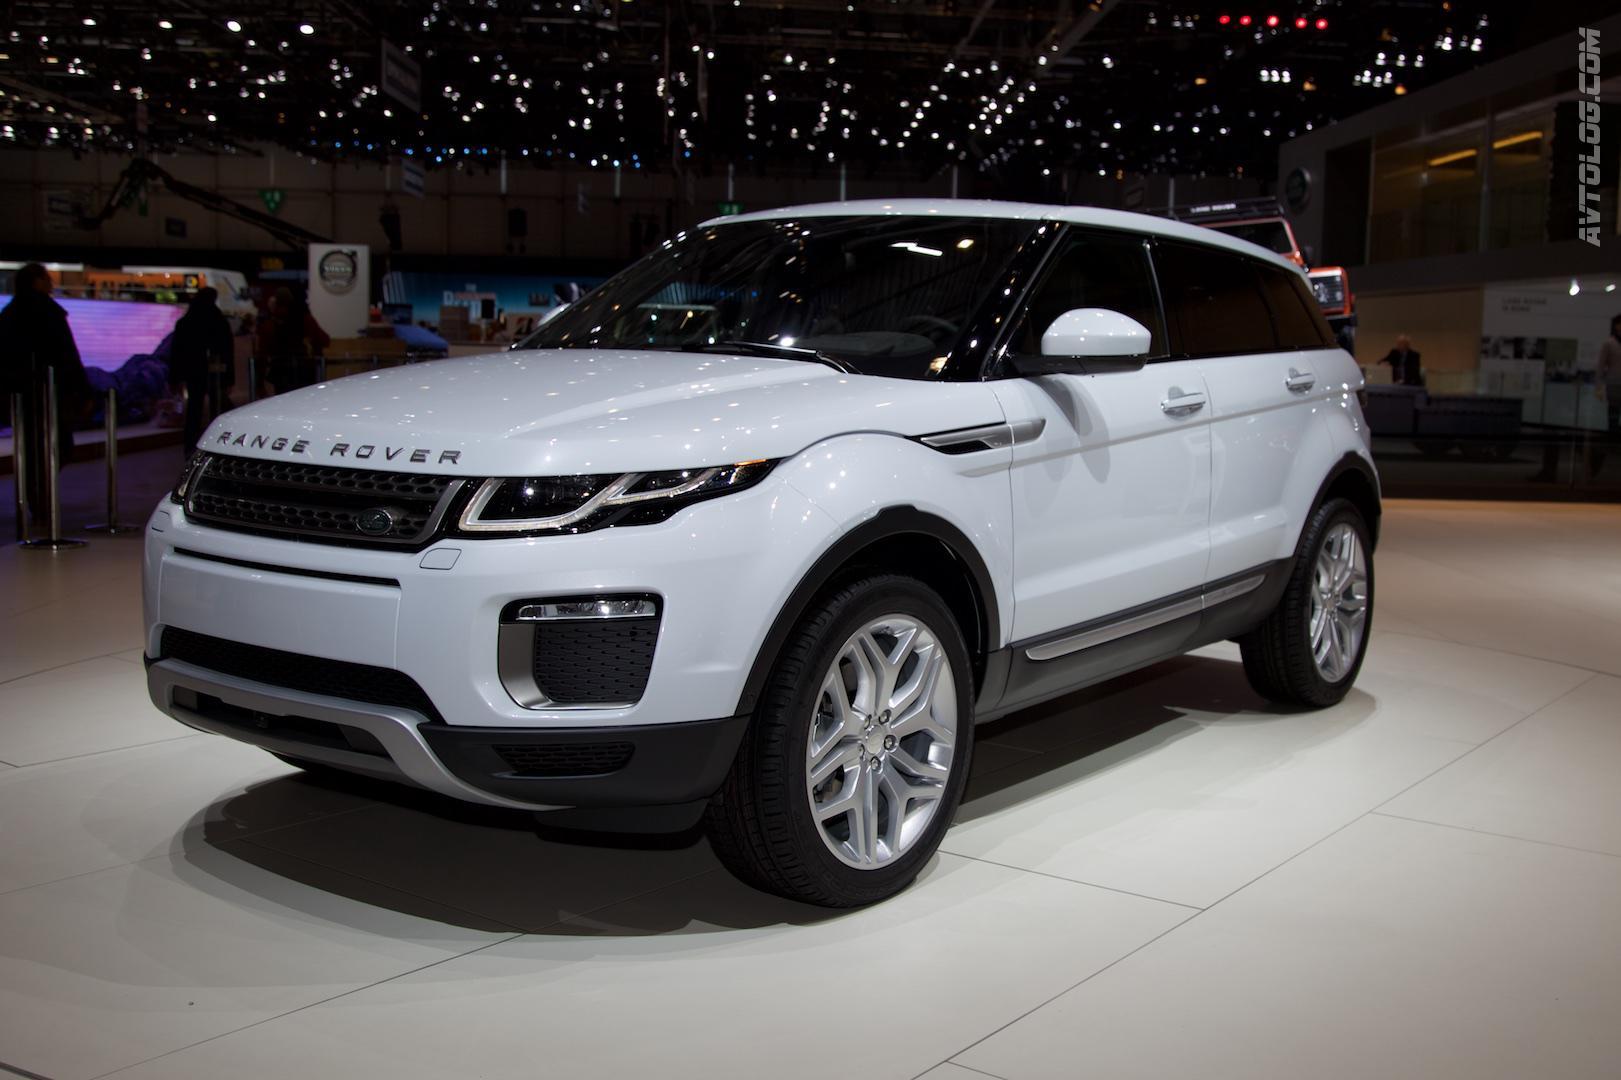 range-rover-evoque-geneva-2015.4903501.jpg